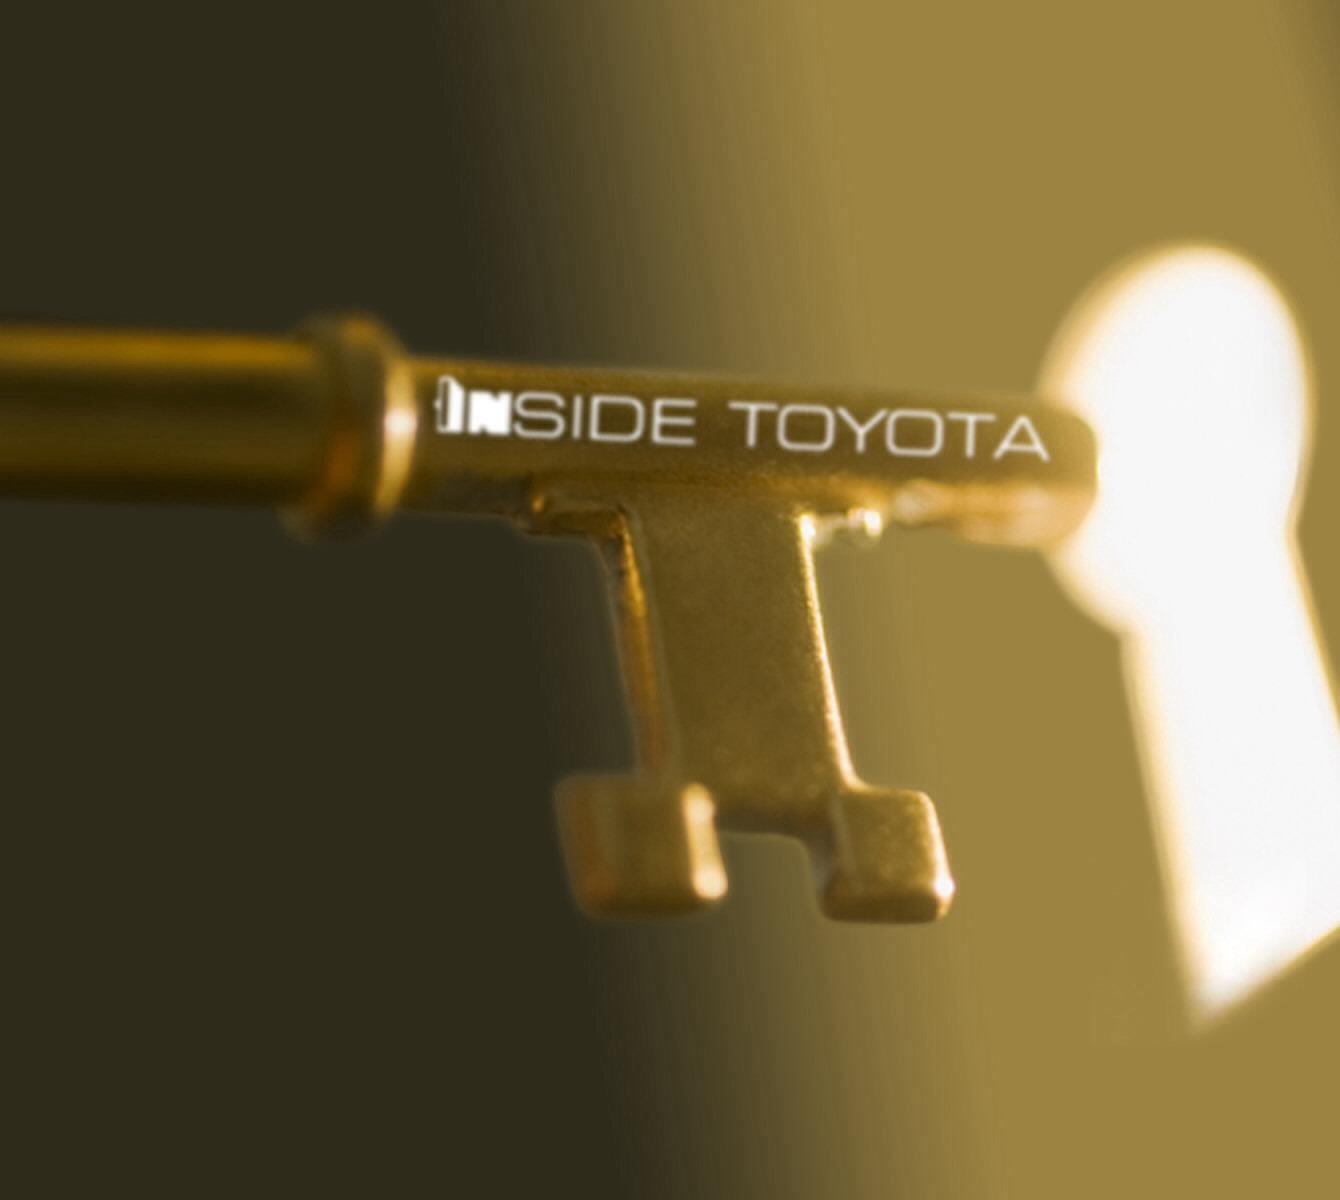 Inside TOYOTA - Magazine cover